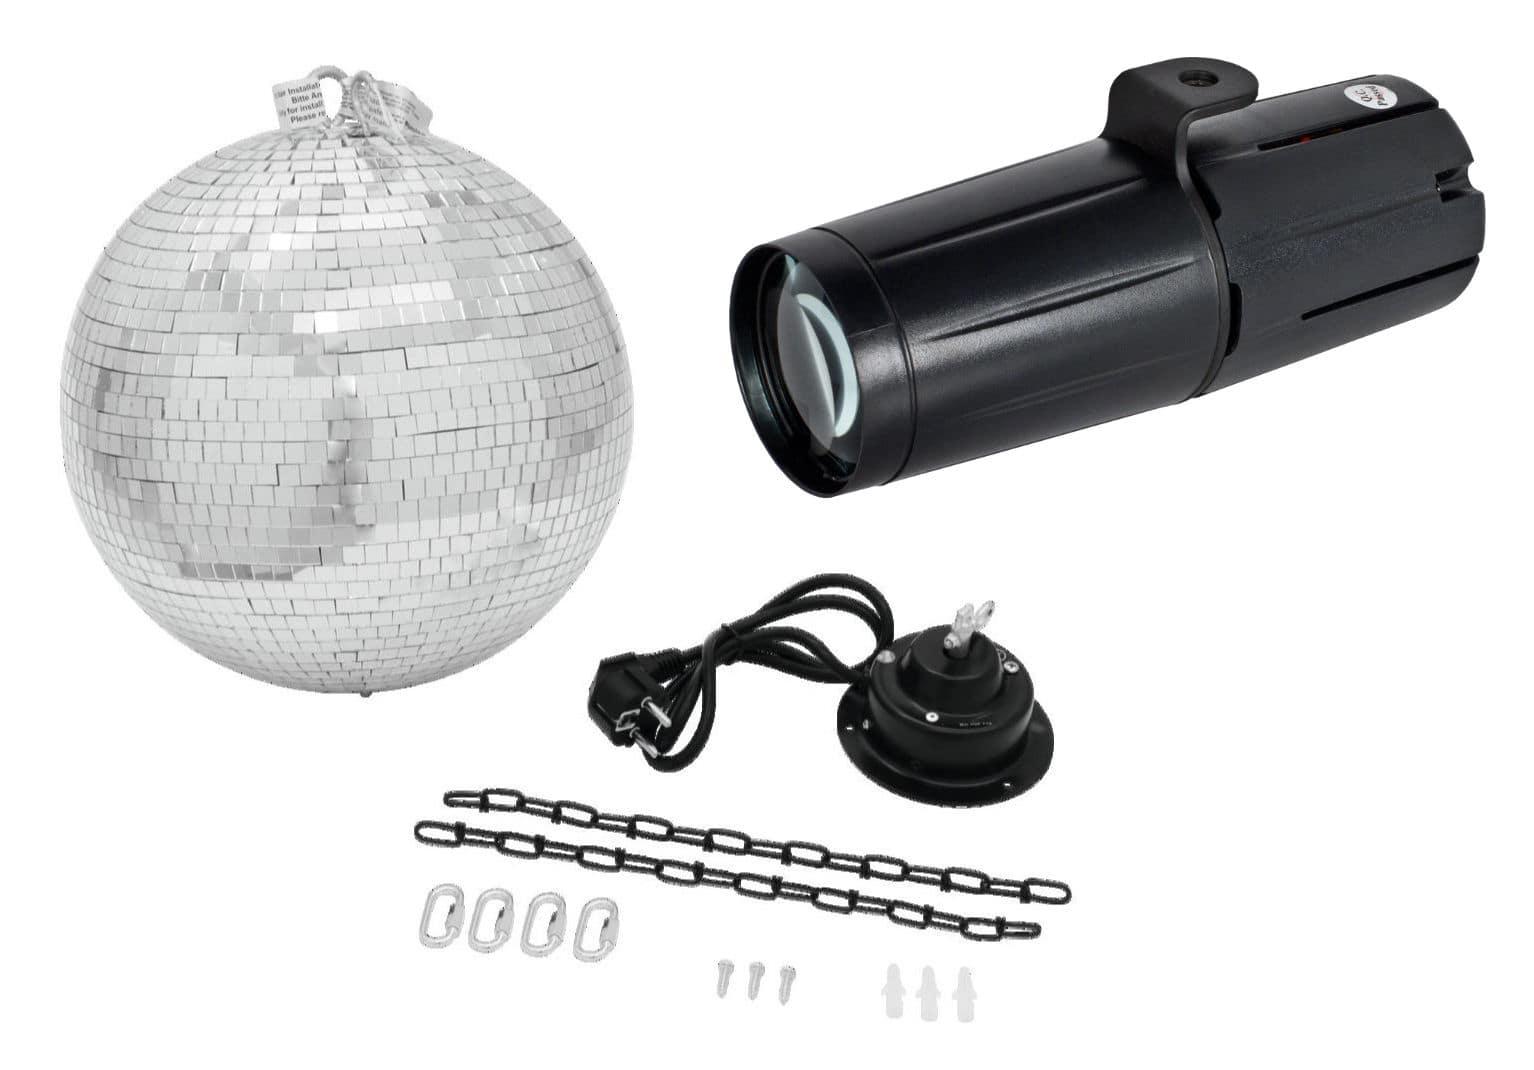 Lichtsets - ADJ Pinspot LED II Spiegelkugel Set - Onlineshop Musikhaus Kirstein